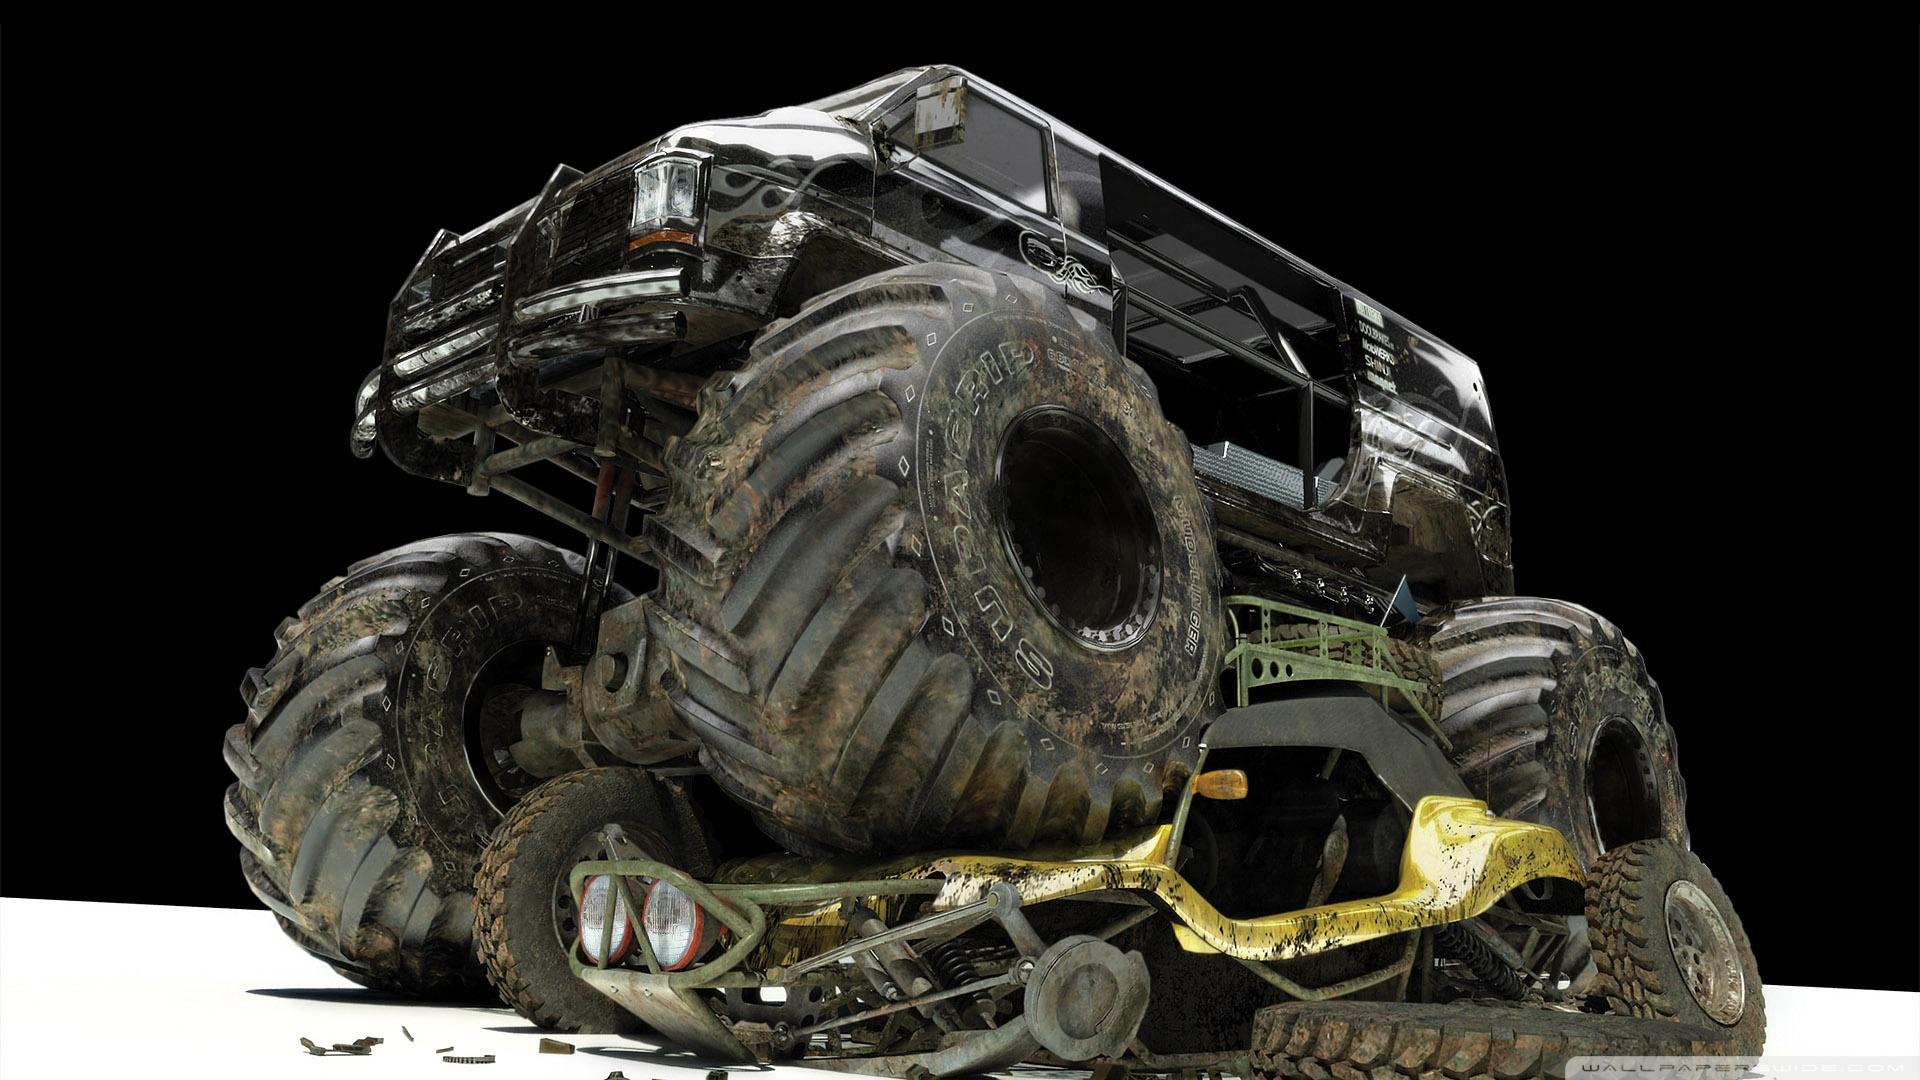 Monster Truck Desktop Wallpaper 1920x1080 pixel Automotive HD 1920x1080